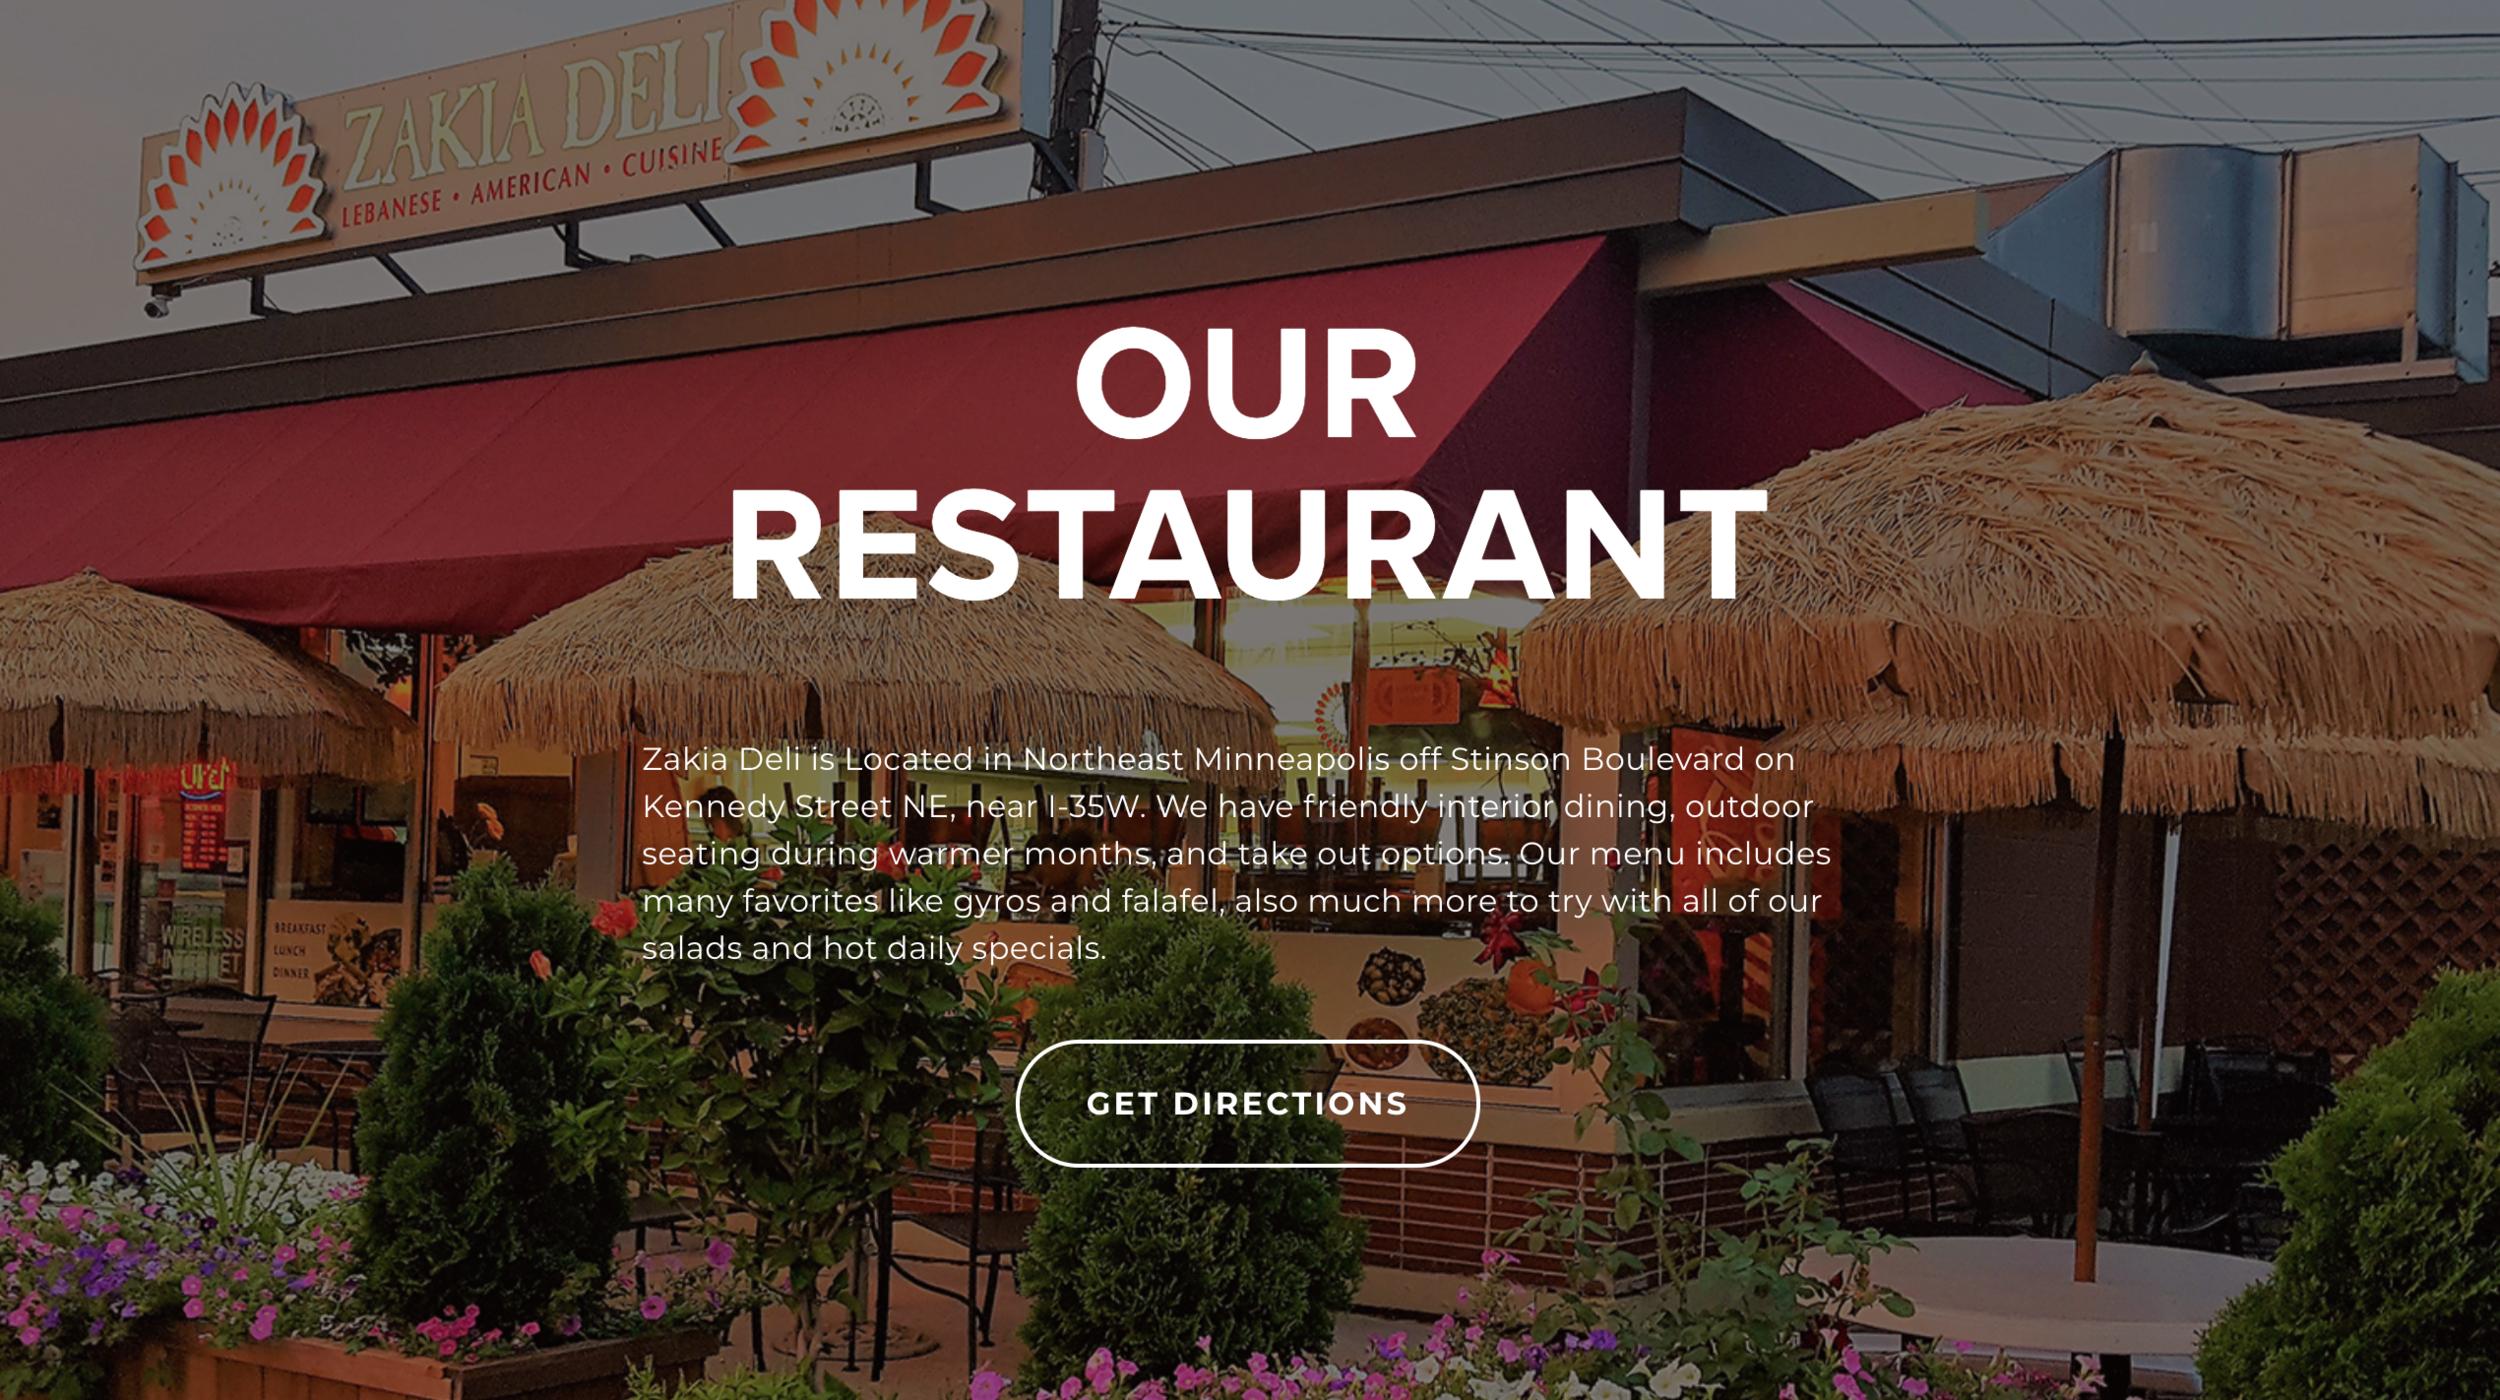 Zakia Deli Our Restaurant Section